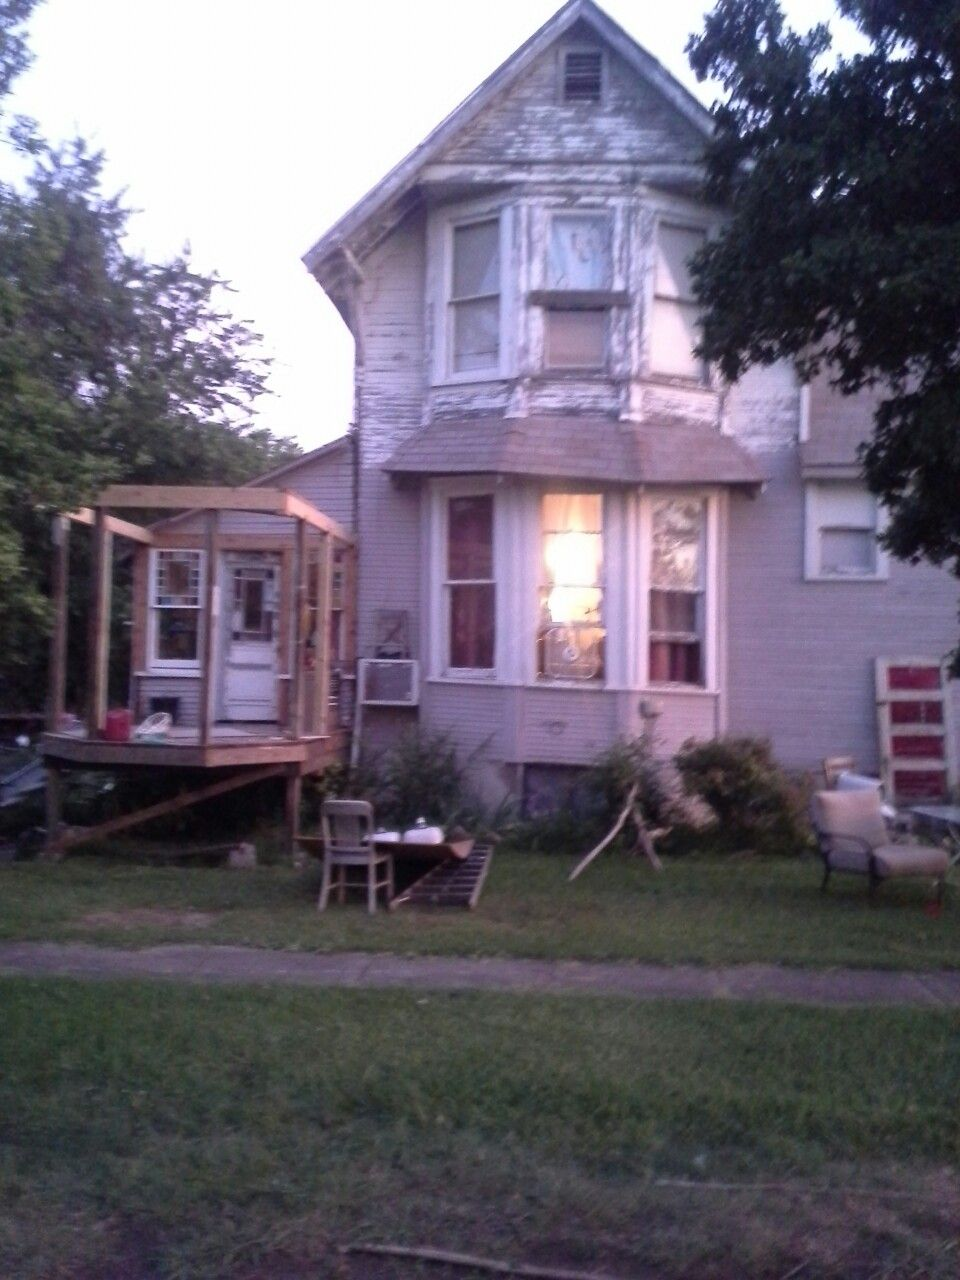 Bay Windows Eventually Eyebrow Roof Will Go And A Balcony Porch